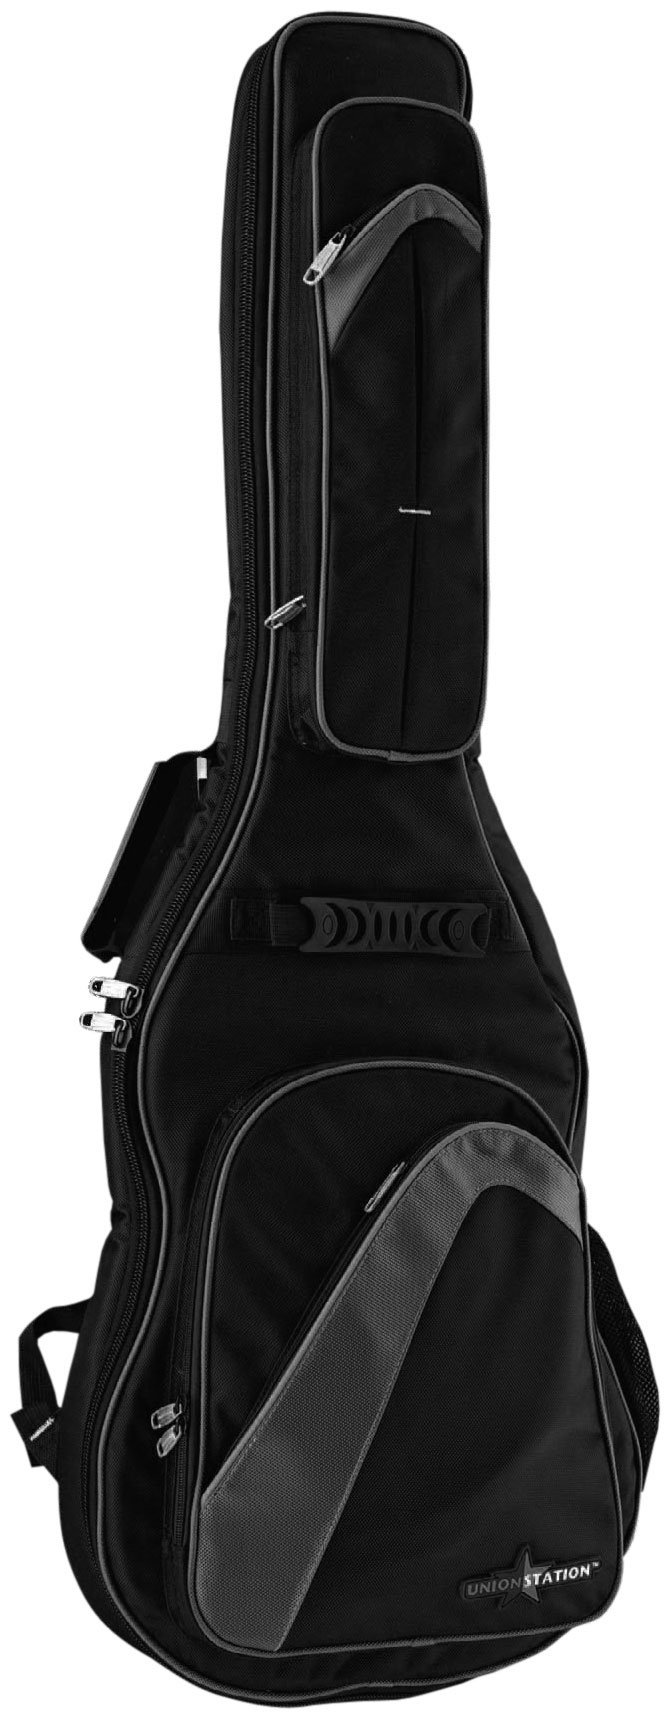 St. Louis Music Inc. USB-25E Electric Guitar Bag 25MM Padded